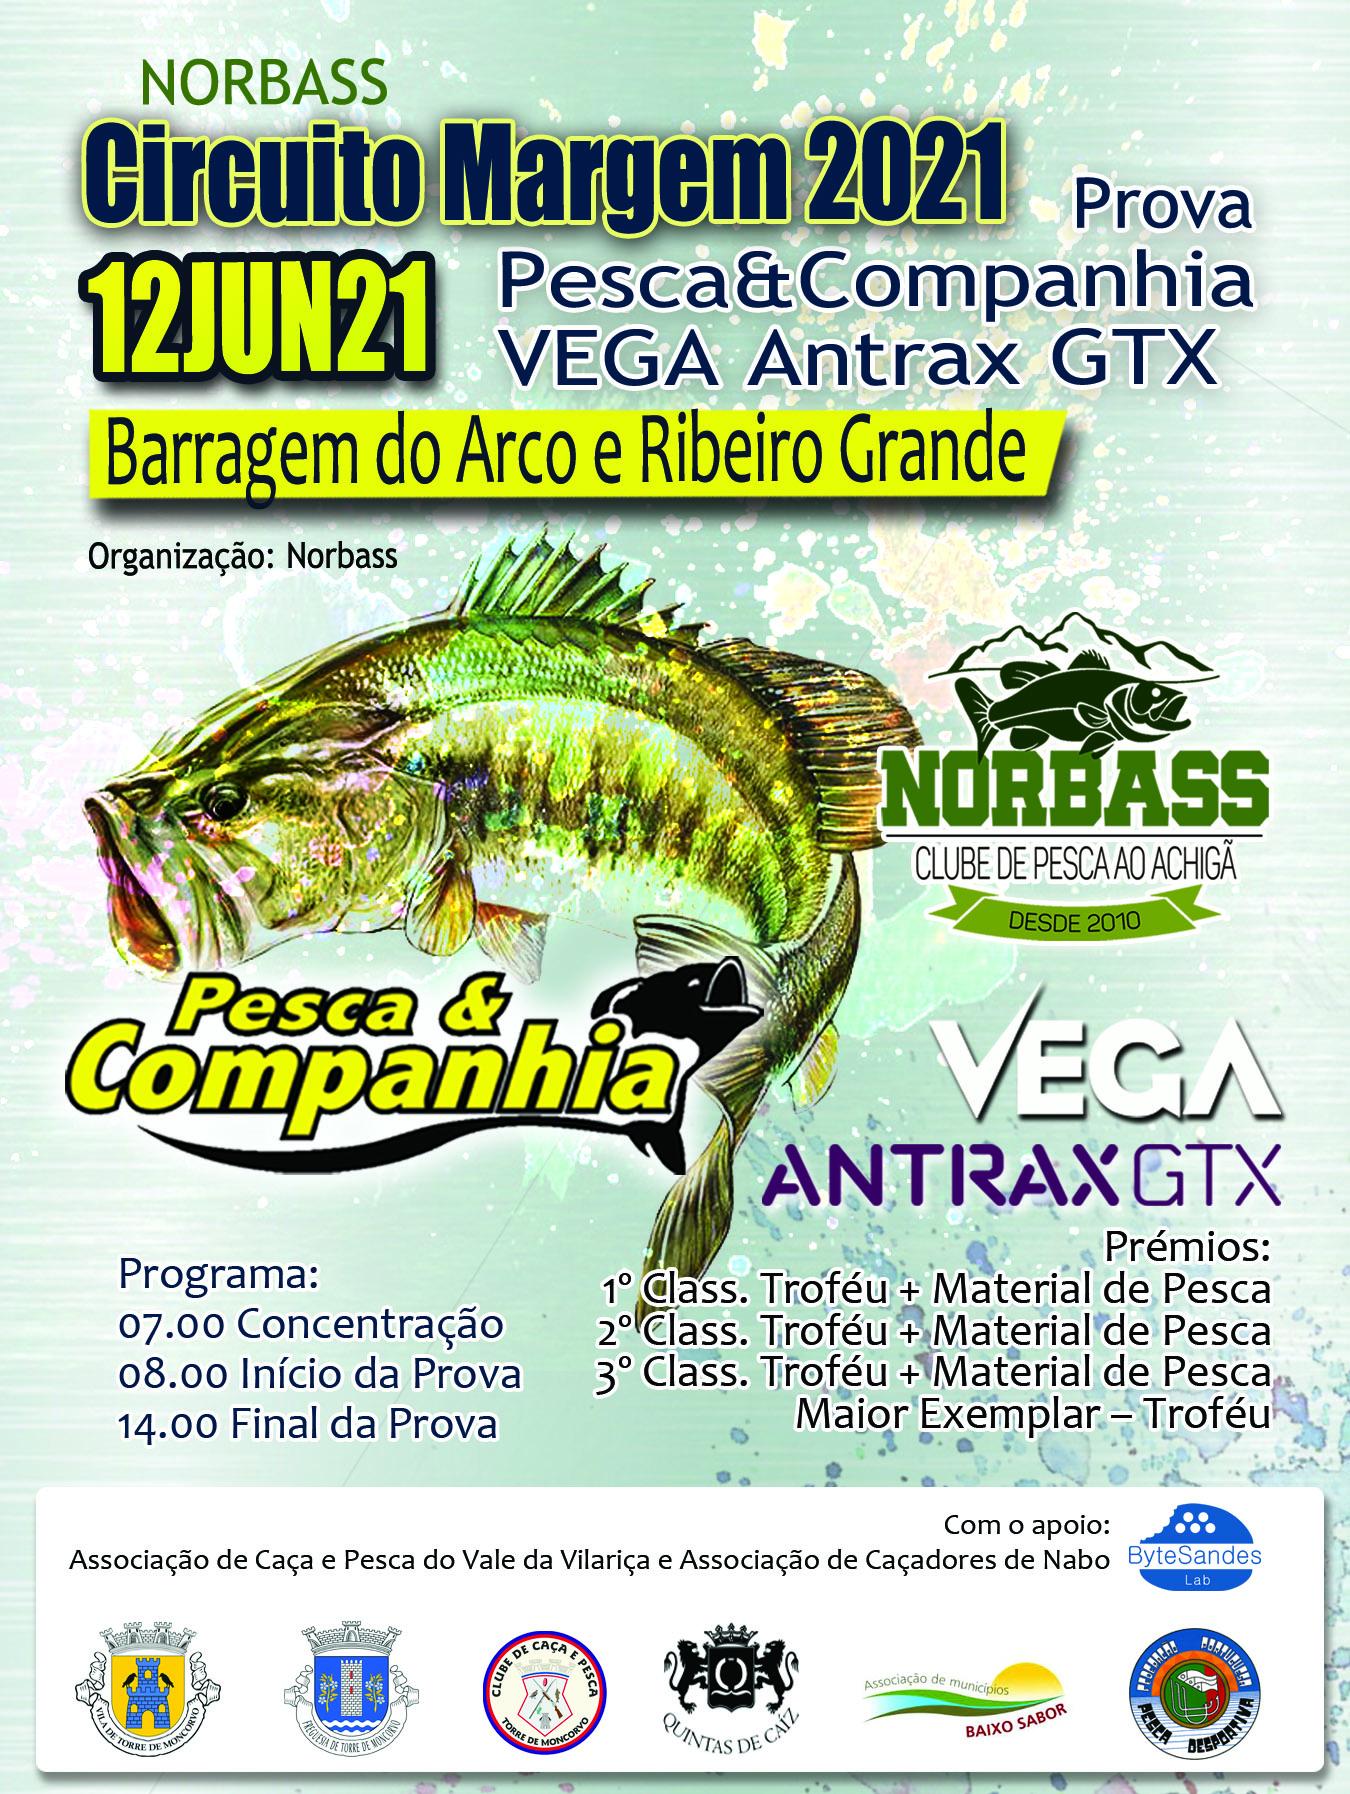 Prova Pesca & Companhia Vega Antrax GTX